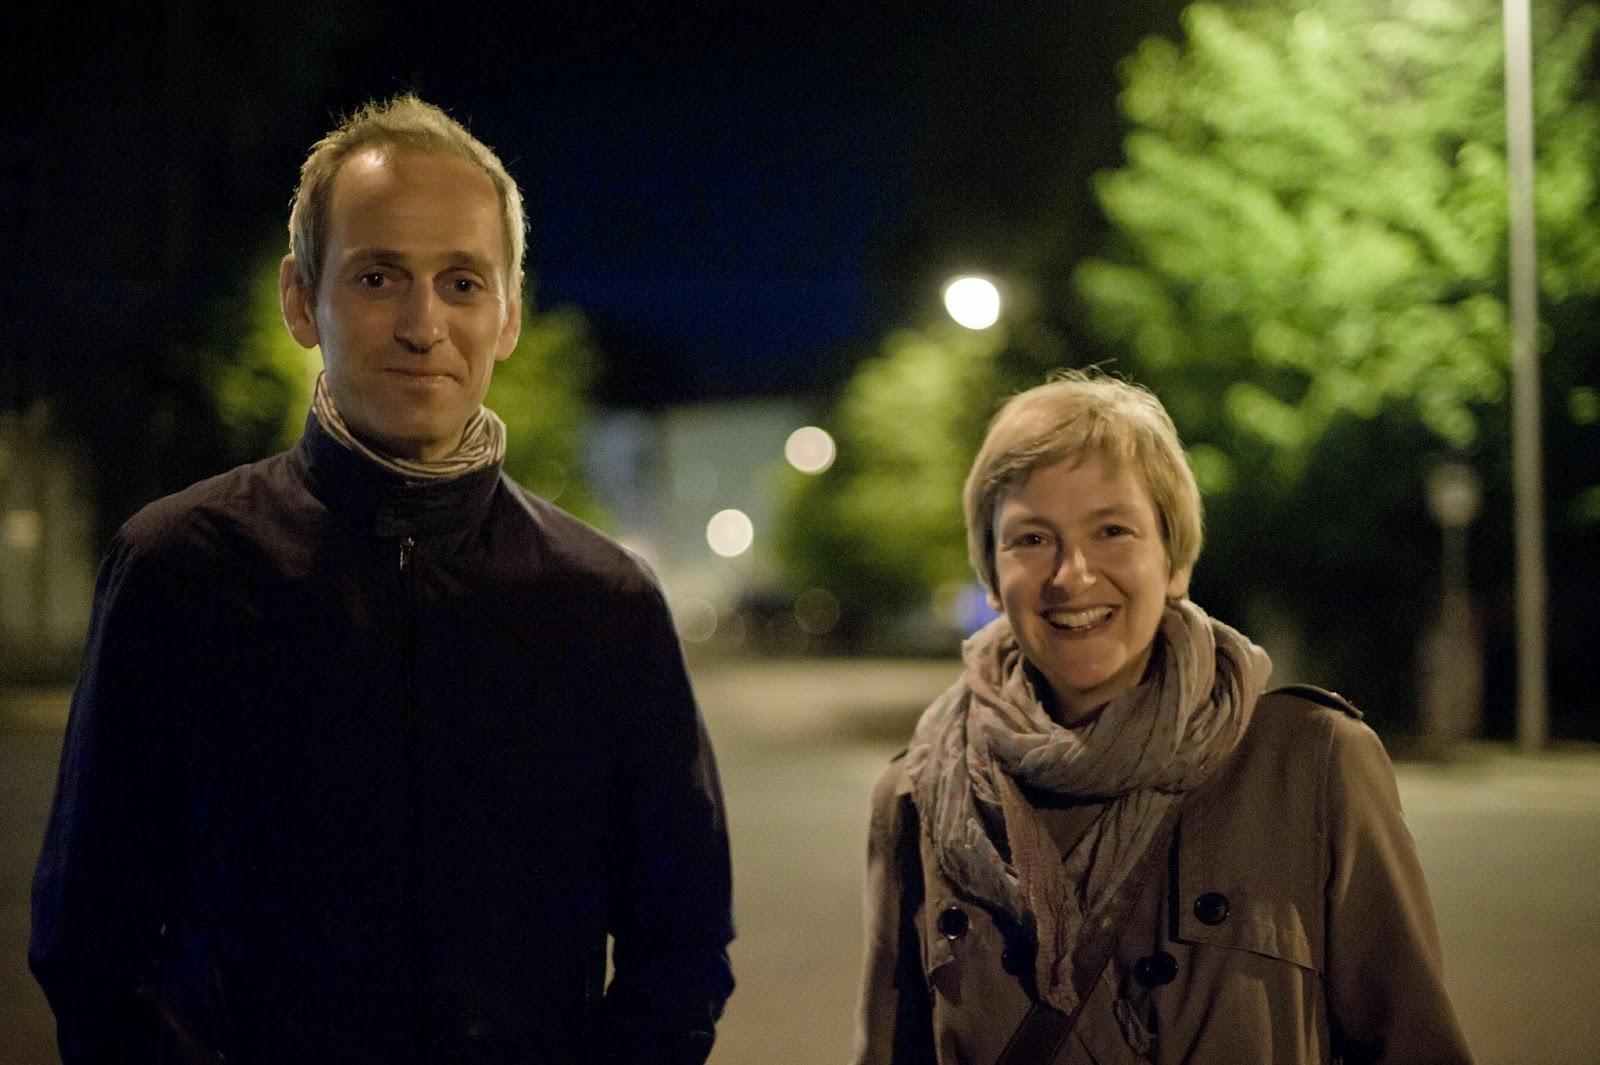 Nina Fischer and Maroan el Sani - happy after their screening